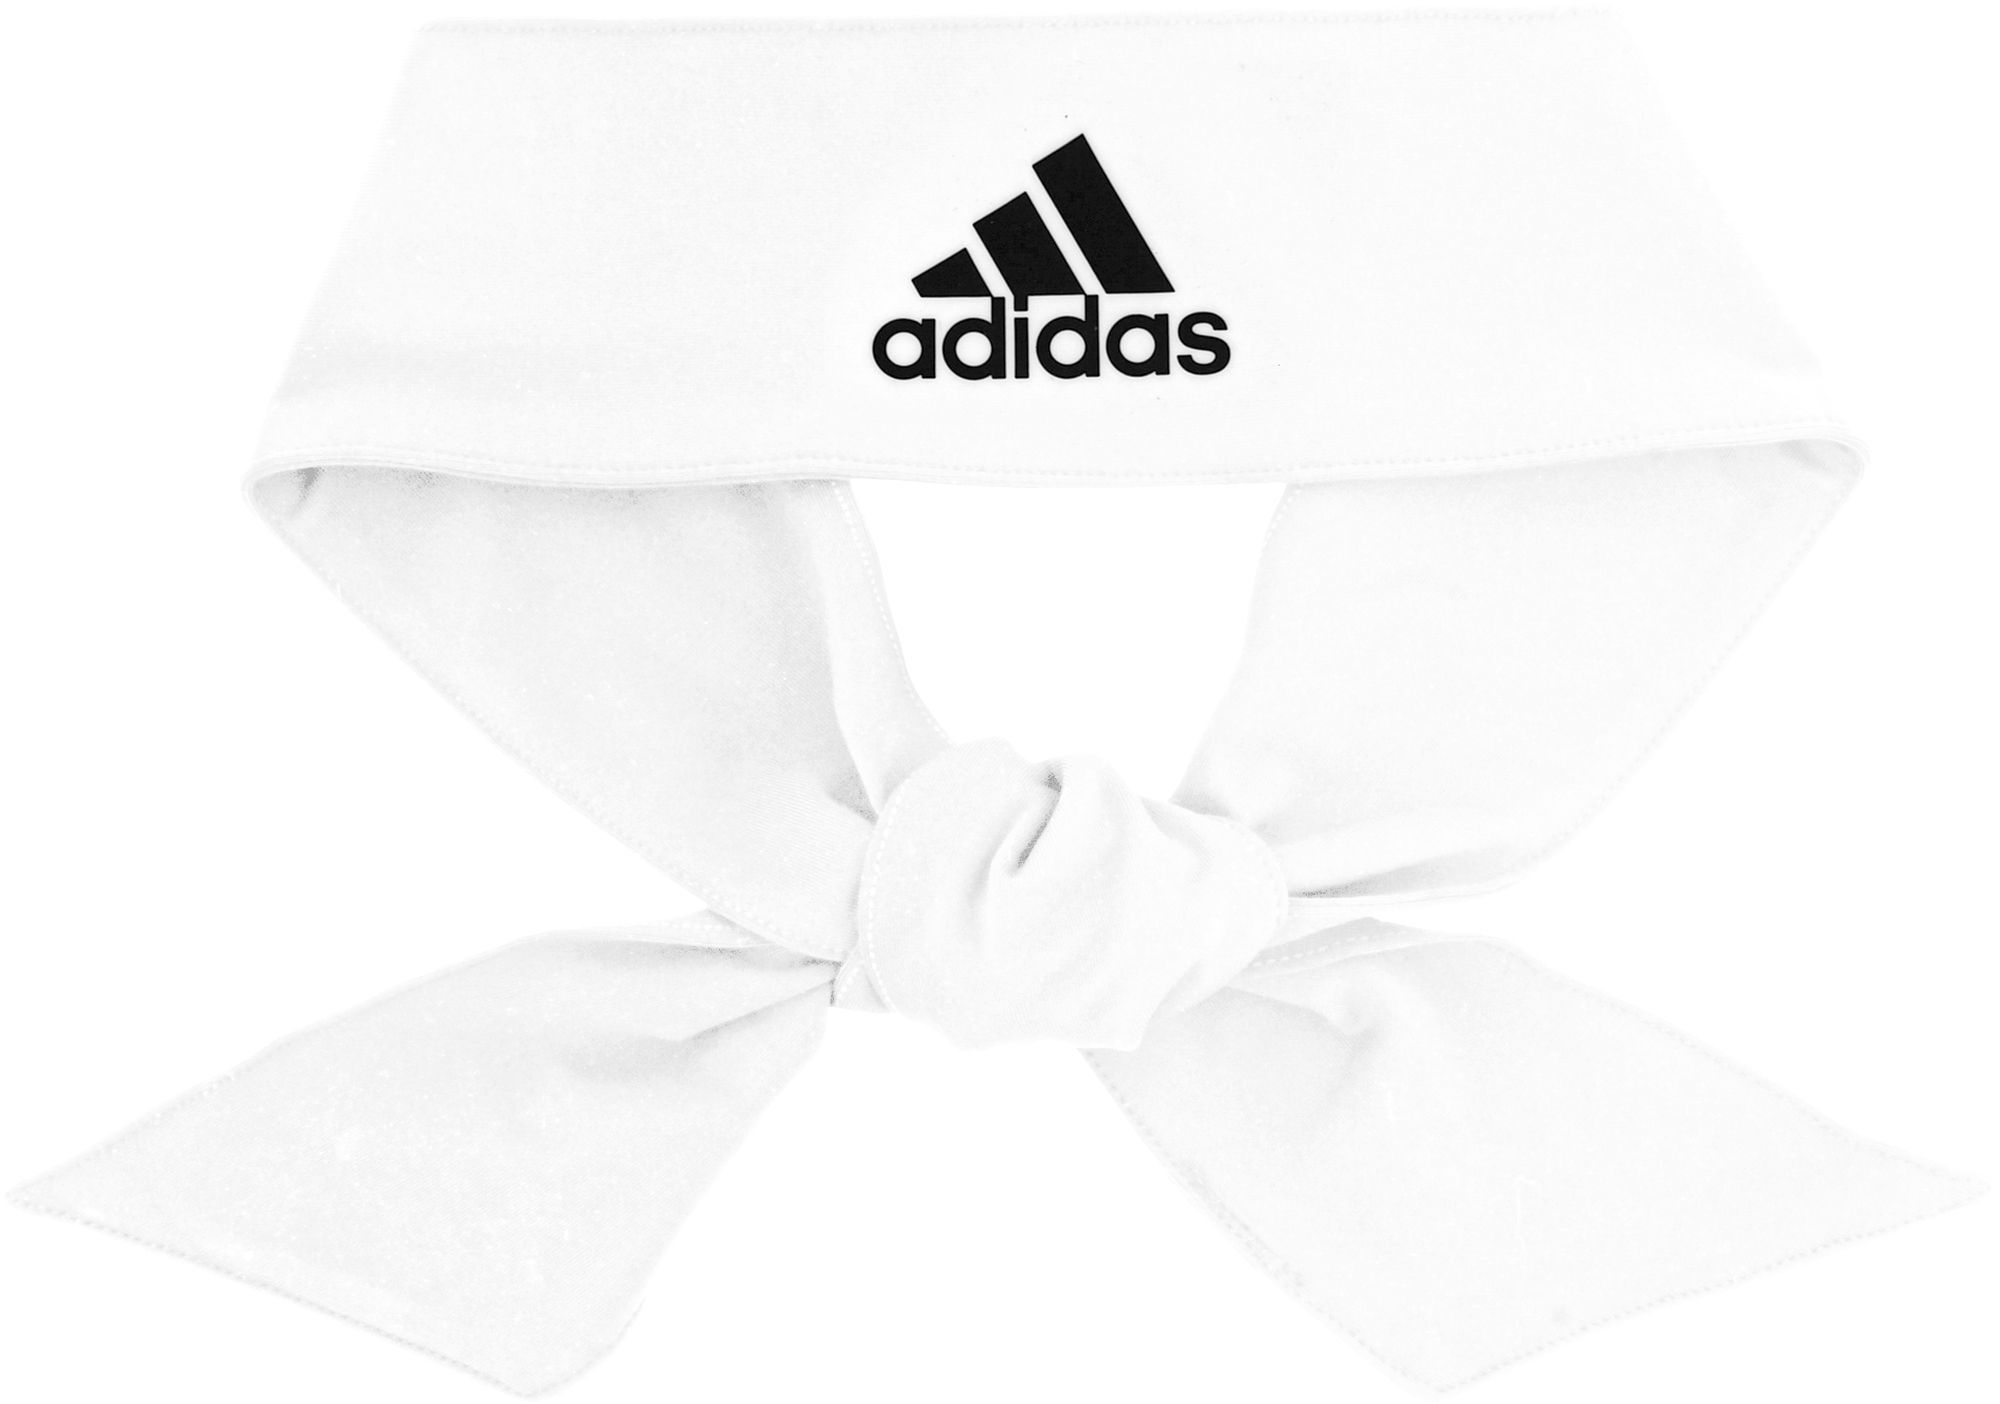 61e7300dfa adidas Alphaskin Tie Headband in 2019 | Products | Tie headband ...